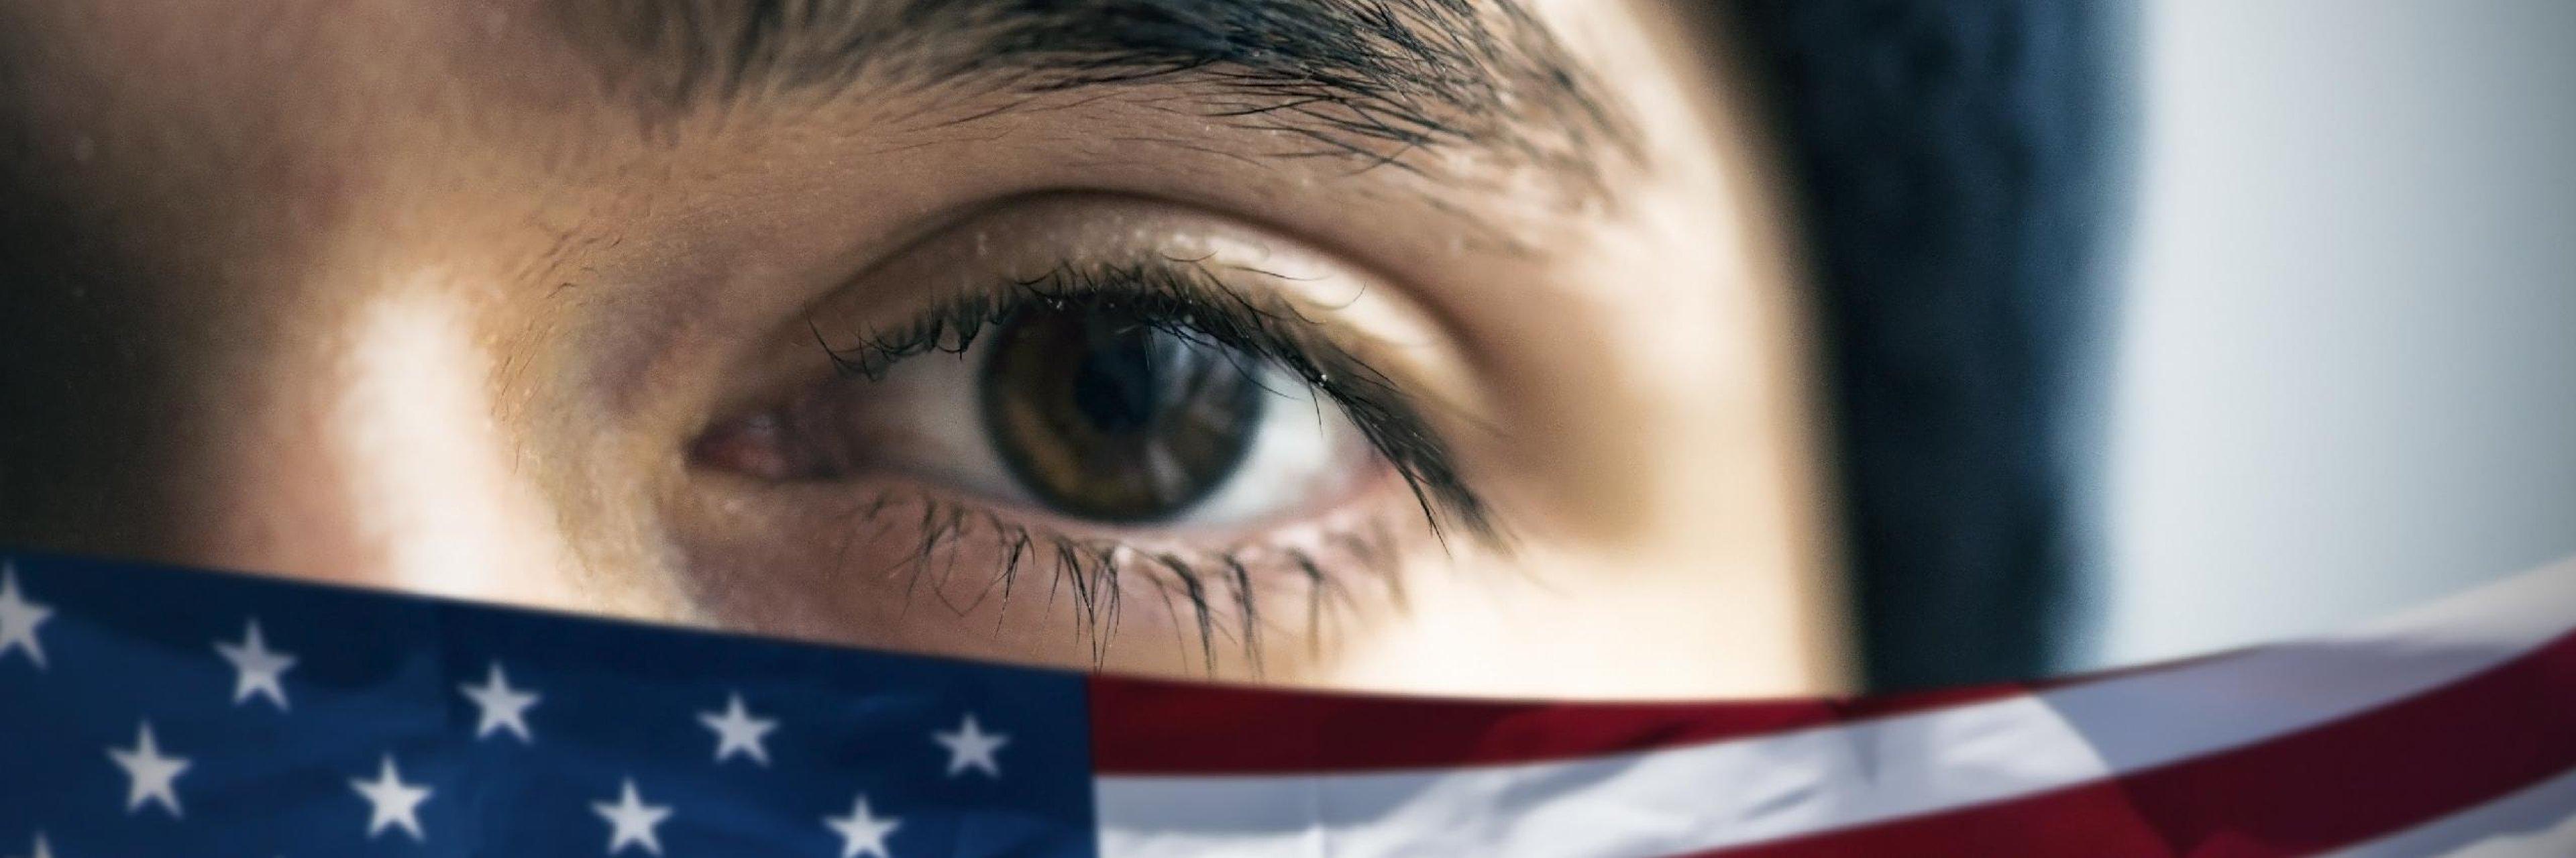 Islamophobia in American Society, Culture, & Politics